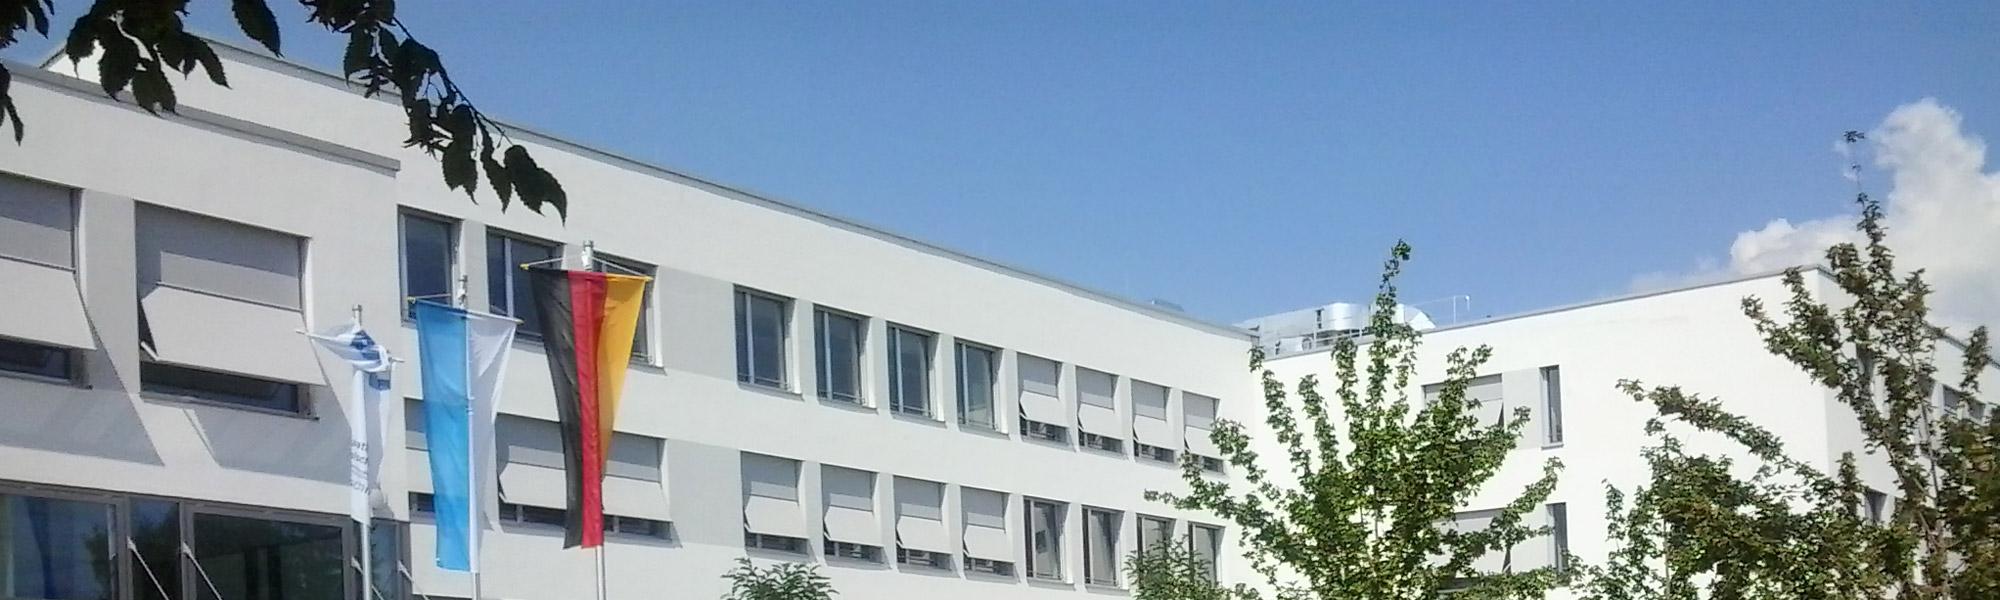 Realschule Herrsching